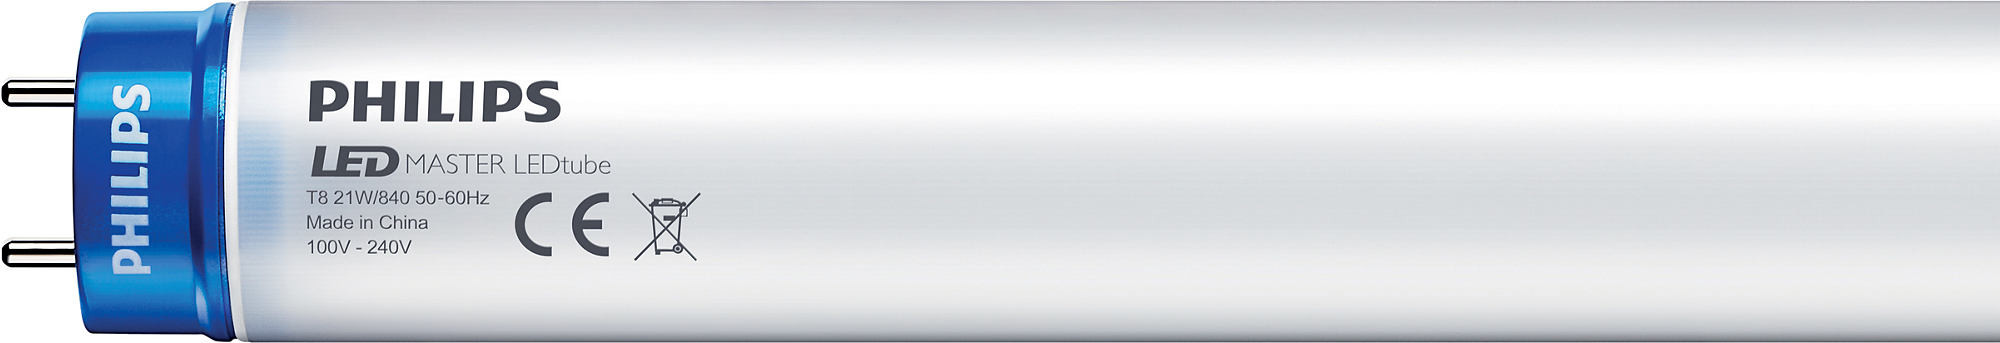 Philips MASTER LEDtube PERF 1500mm 31W 840 T8 C